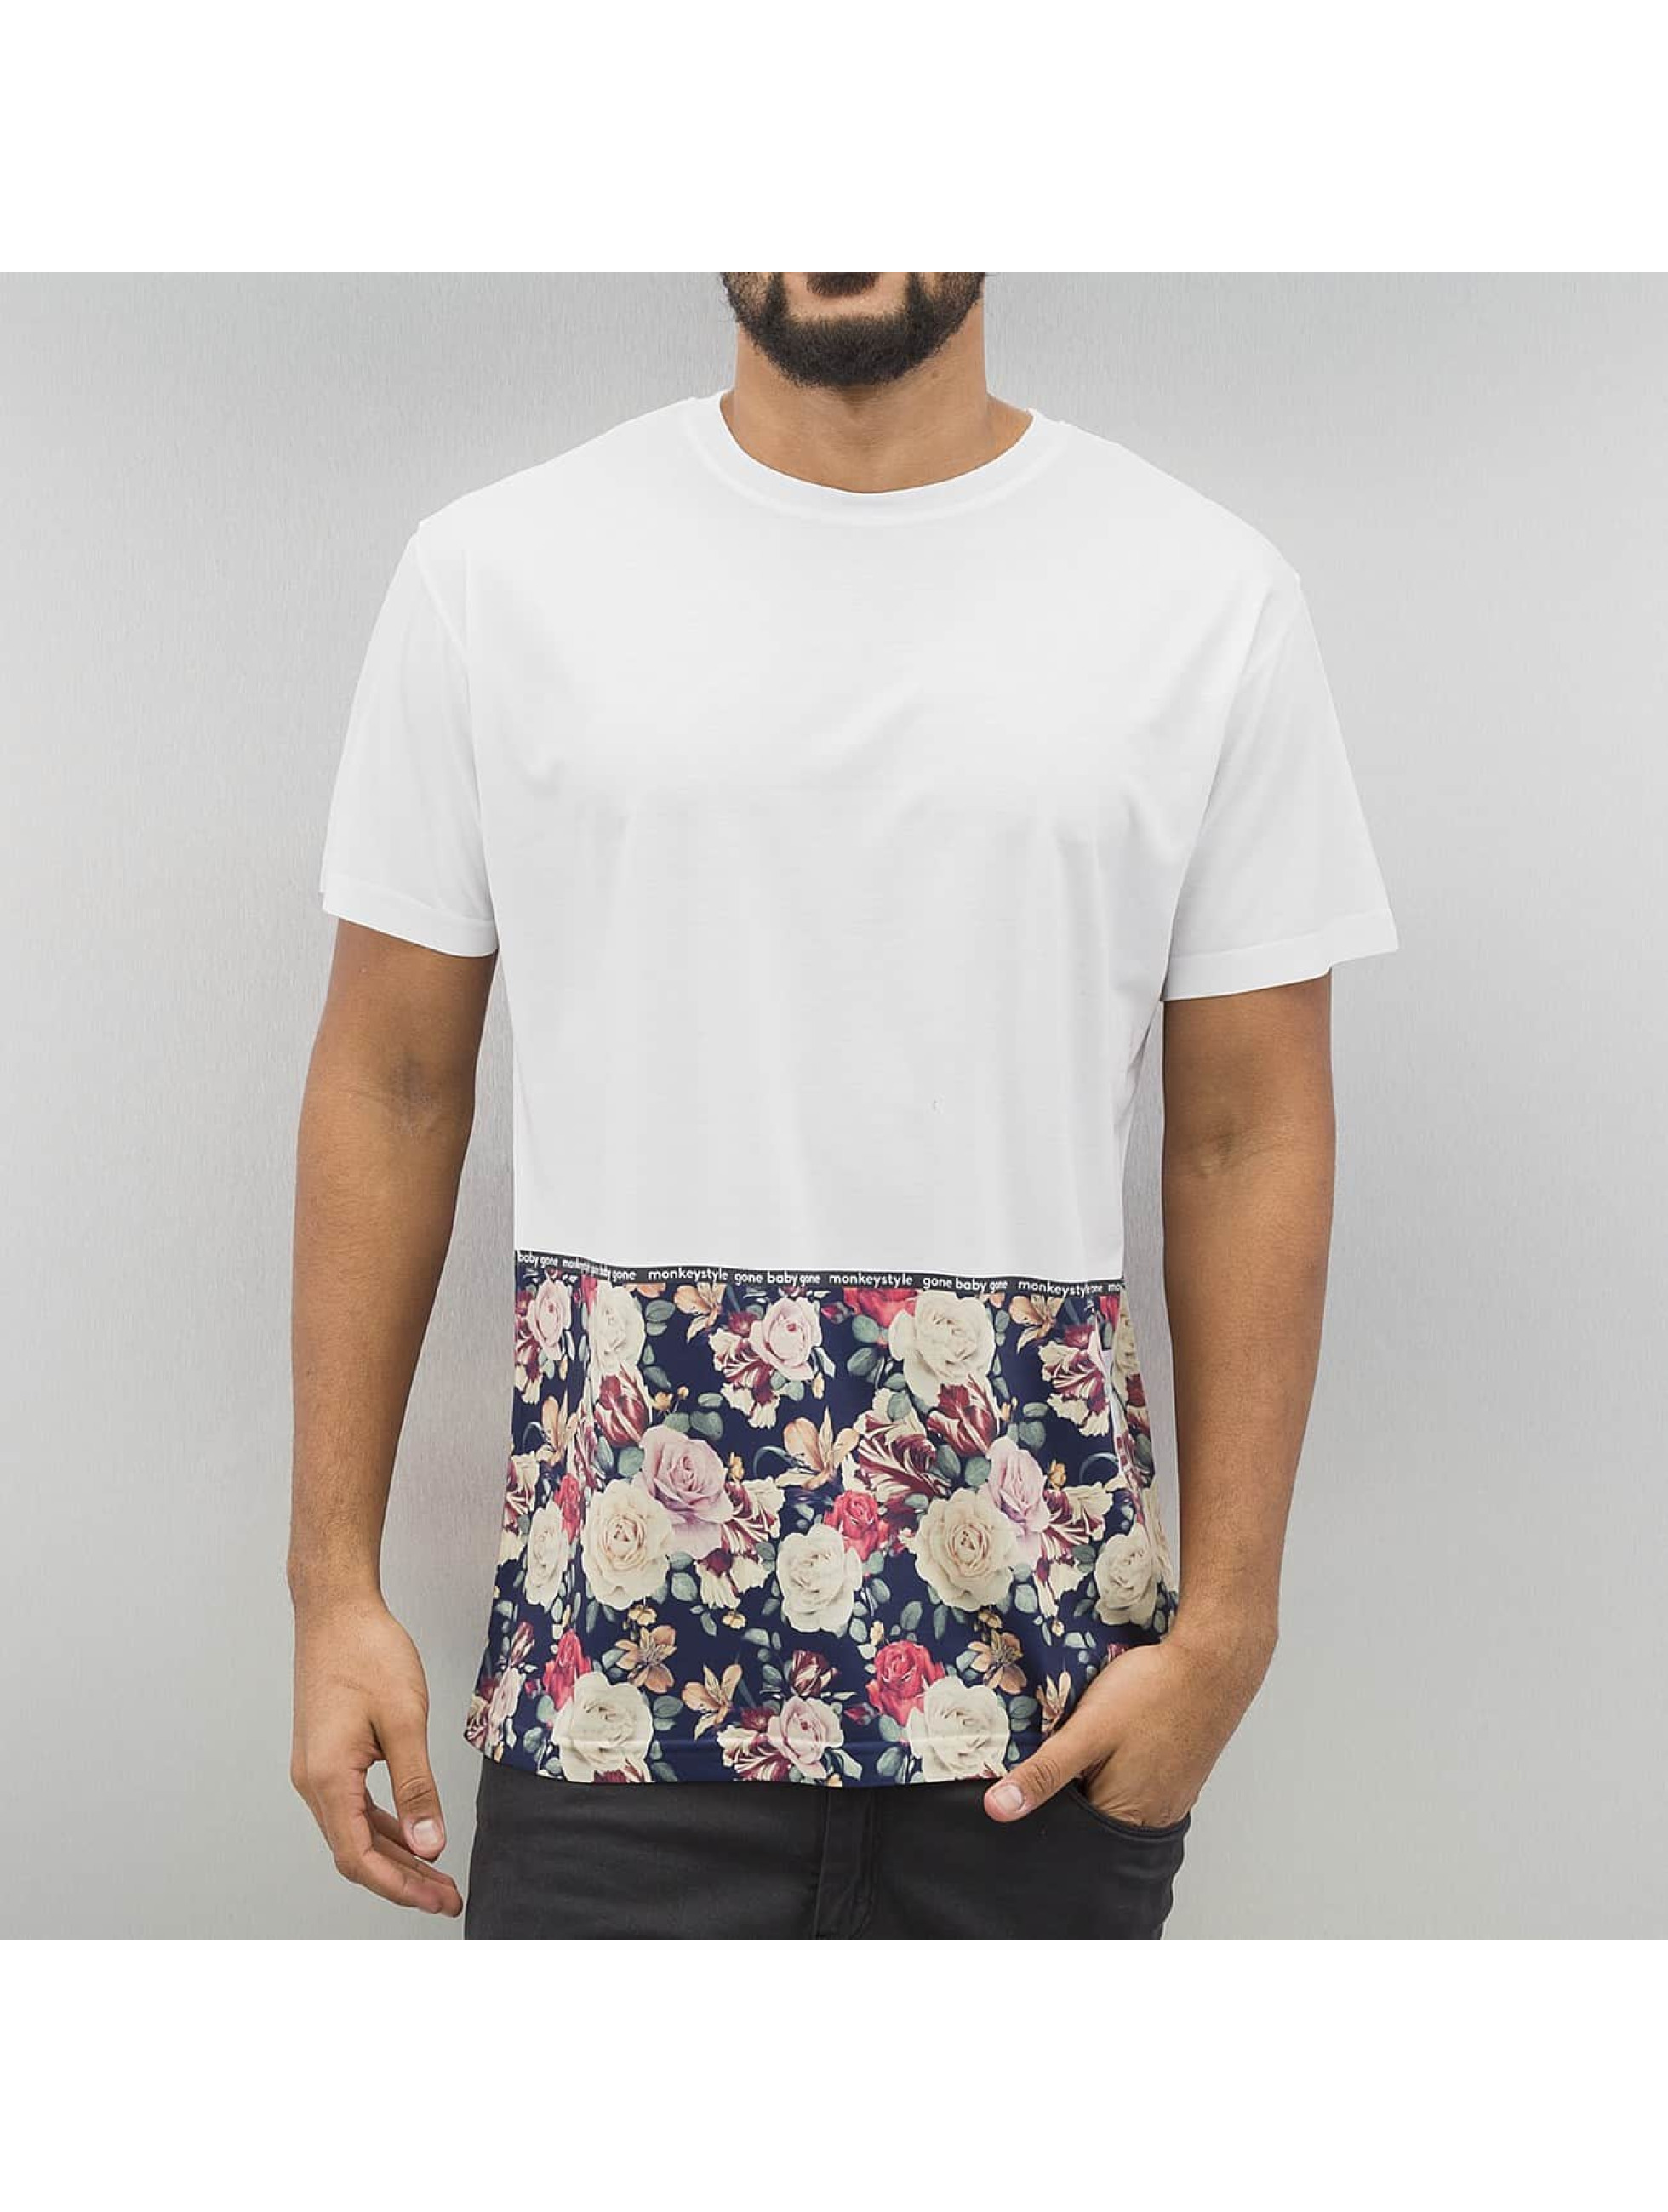 T-Shirt Monkey Business Flowers Hem en blanc